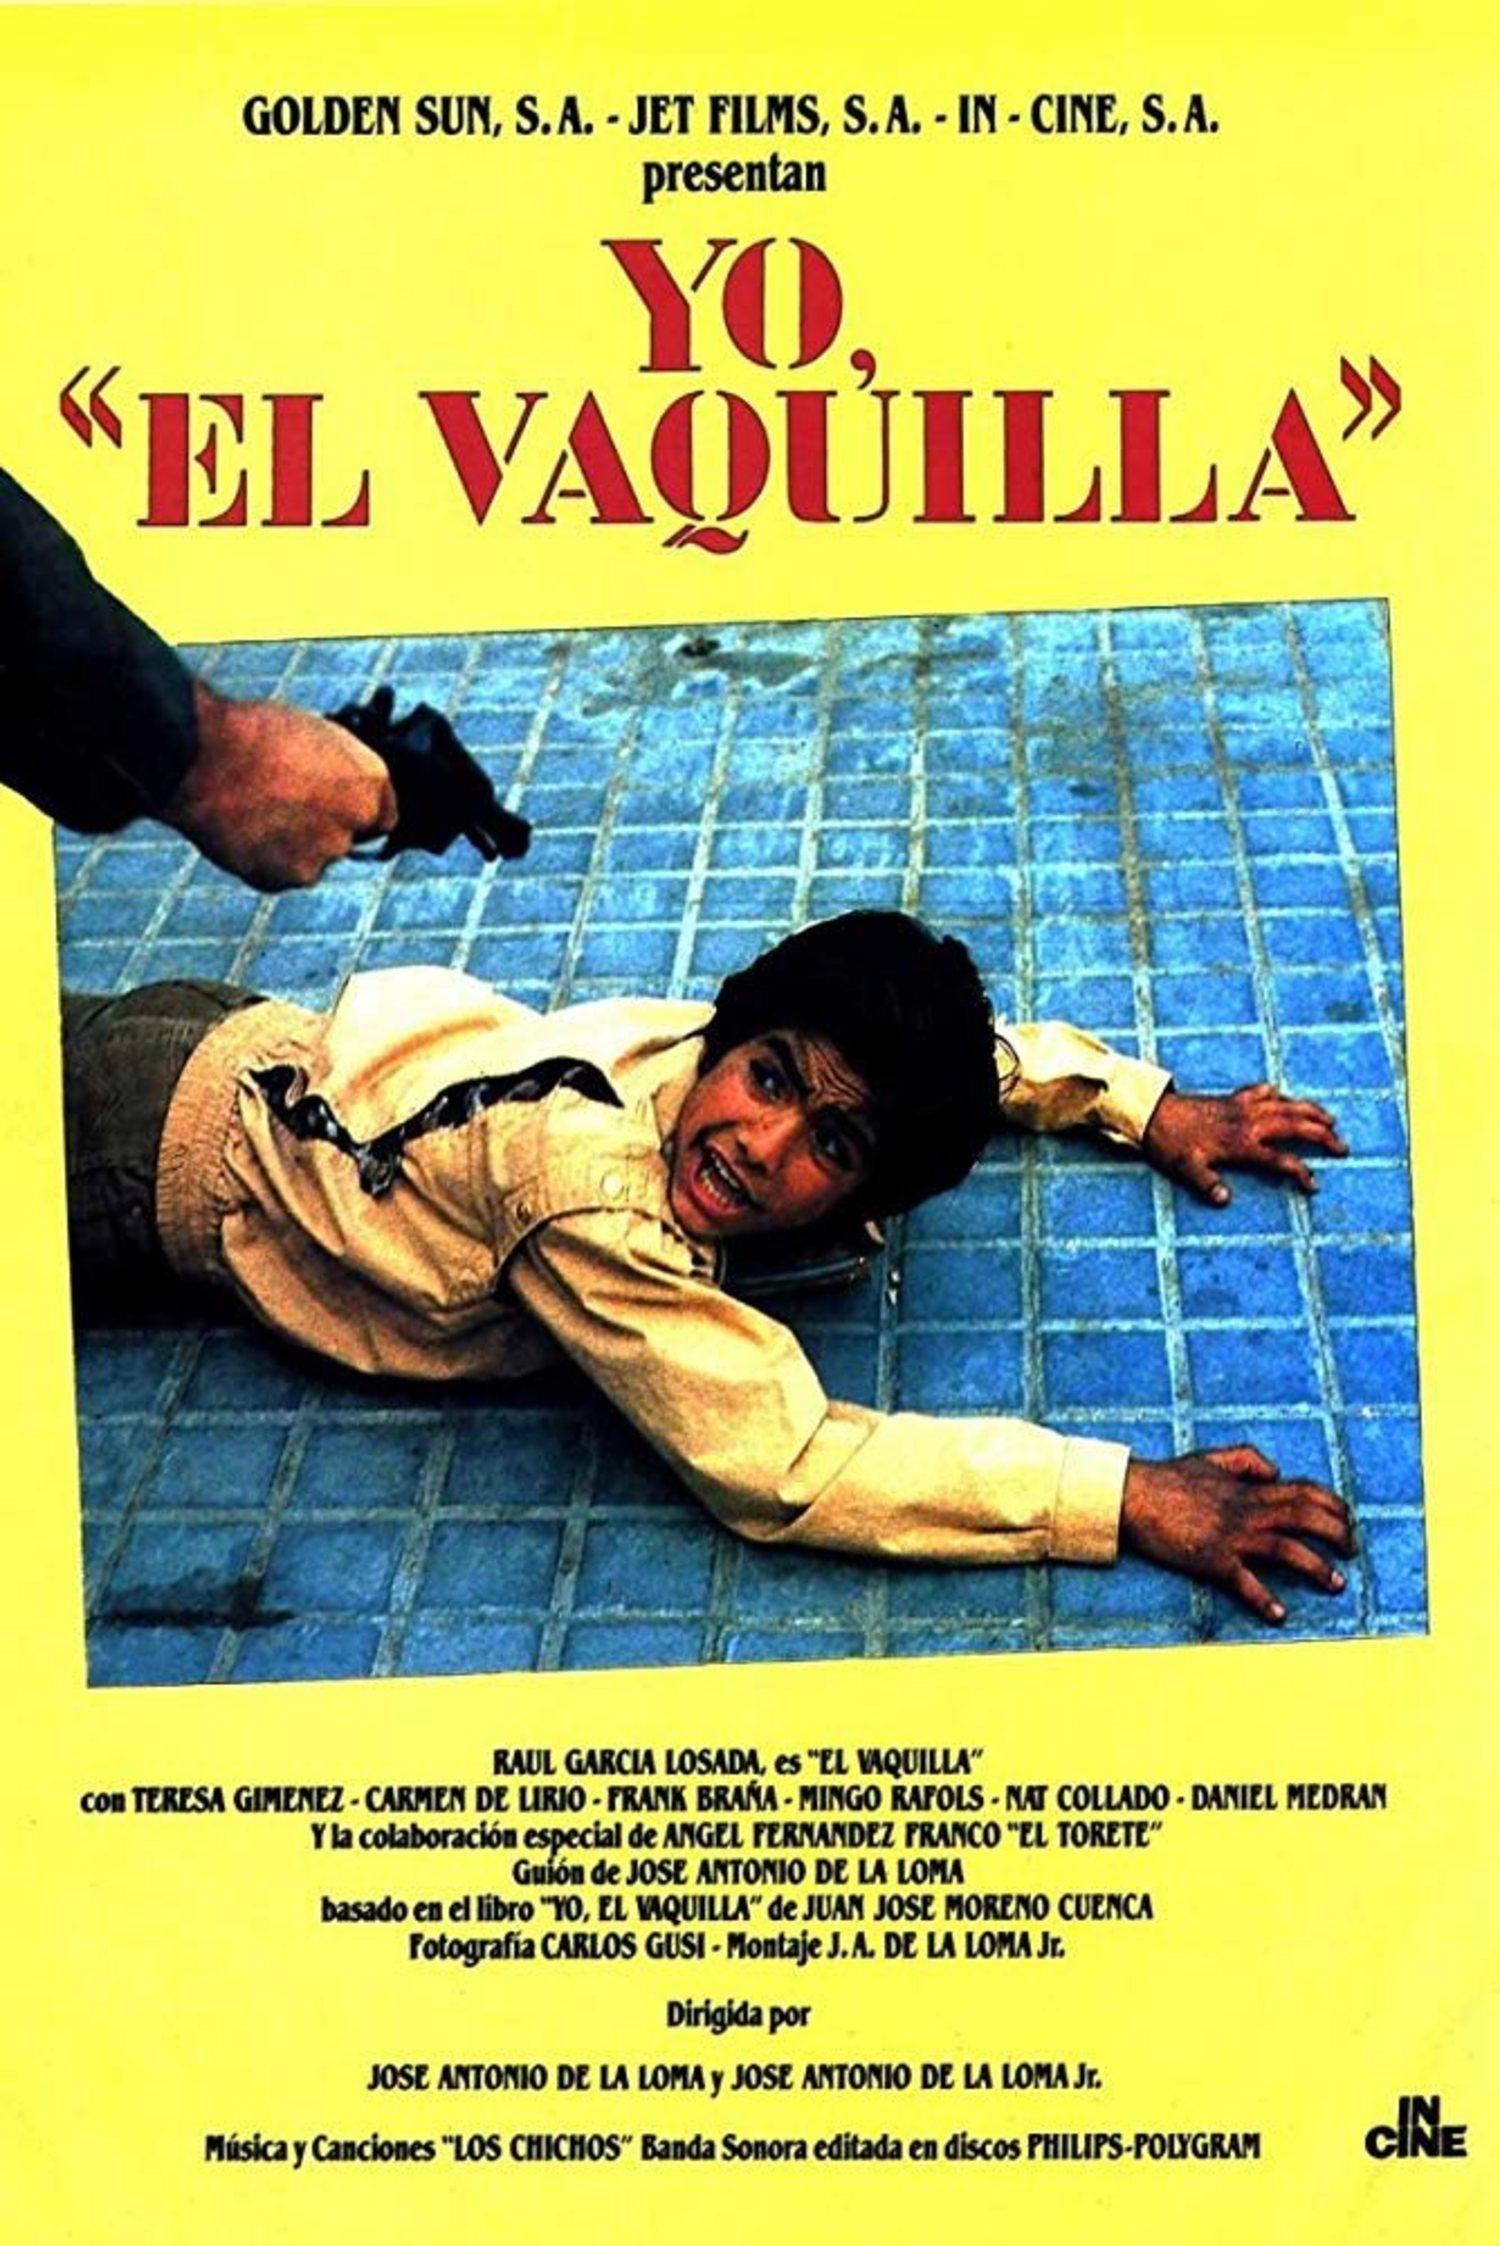 En 1985 se estrenó 'Yo, el Vaquilla', película que narra la vida criminal de Juan José Moreno Cuenca. Es una obra esencial de la filmografía quinqui.